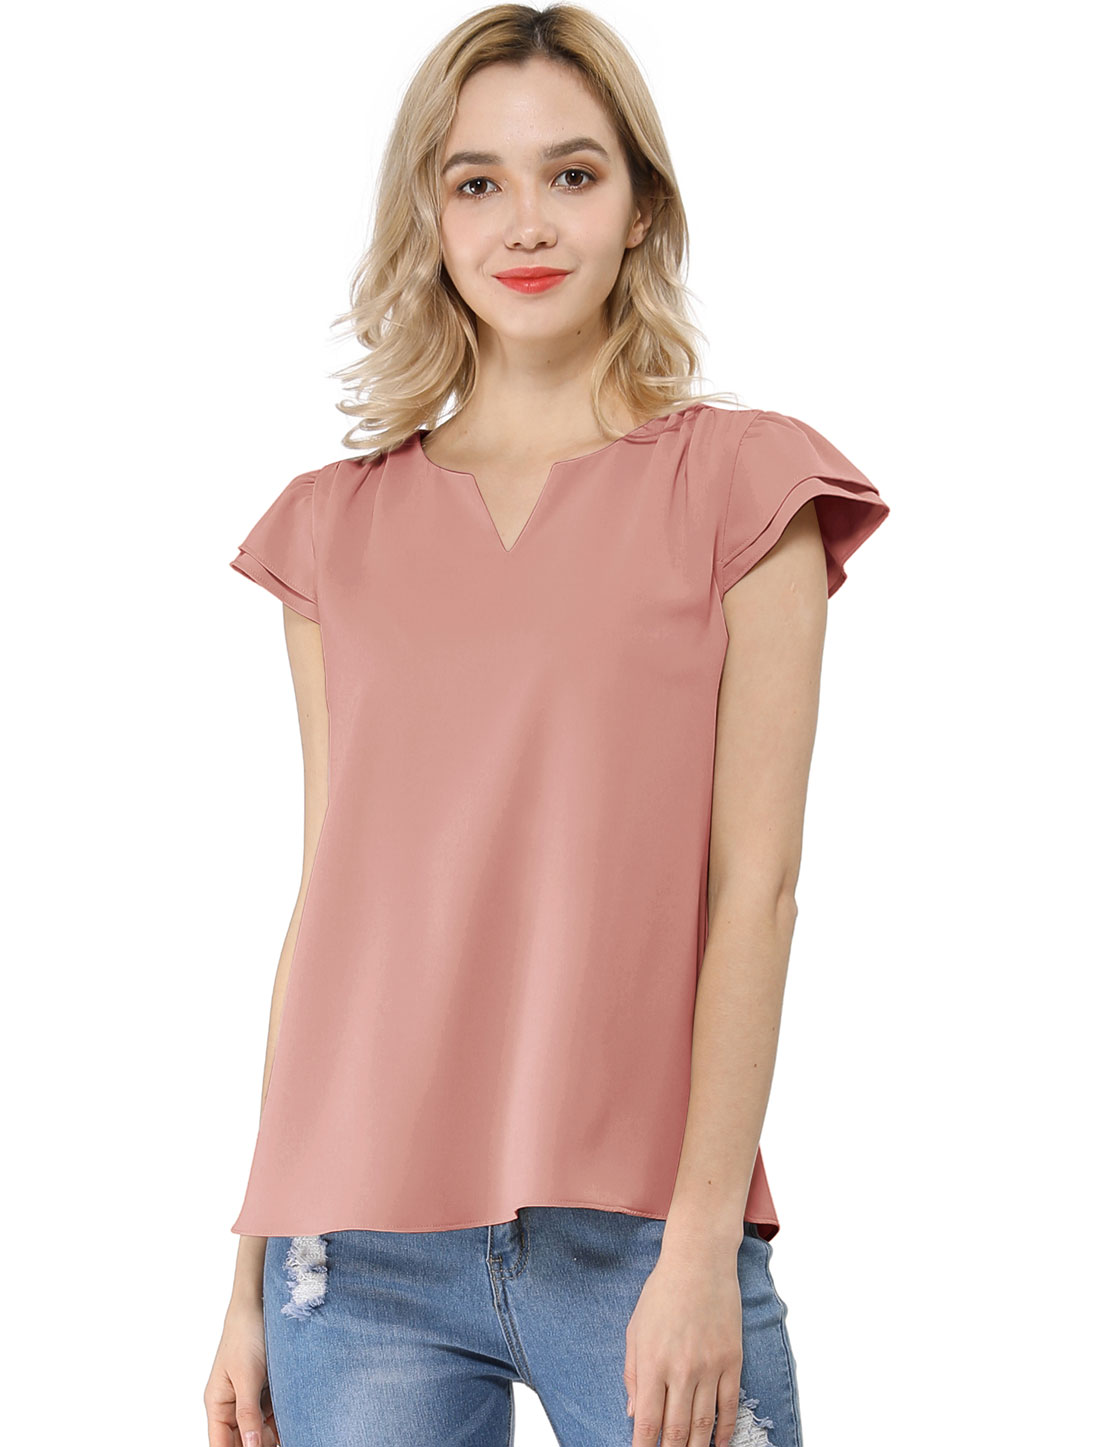 Allegra K Women's Work Business Casual Cap Sleeve Blouse Pink XS